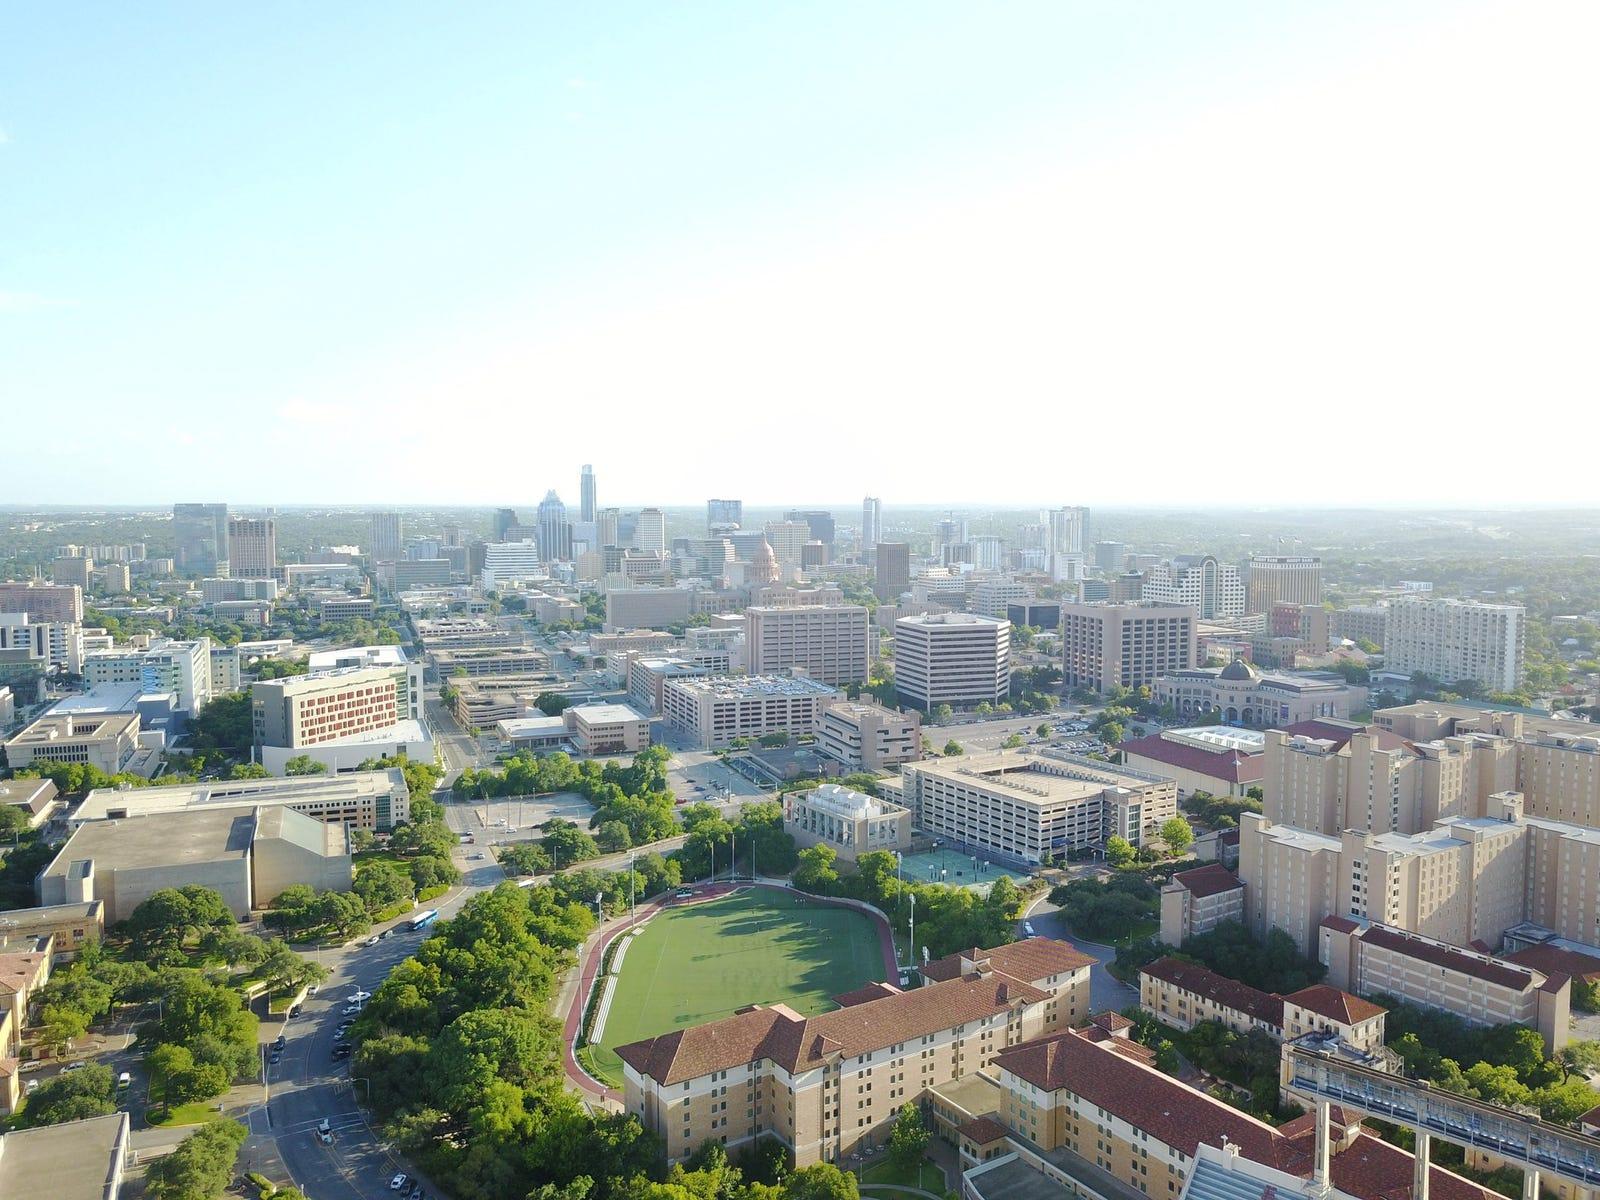 Downtown Austin from Darrell K Royal - Texas Memorial Stadium